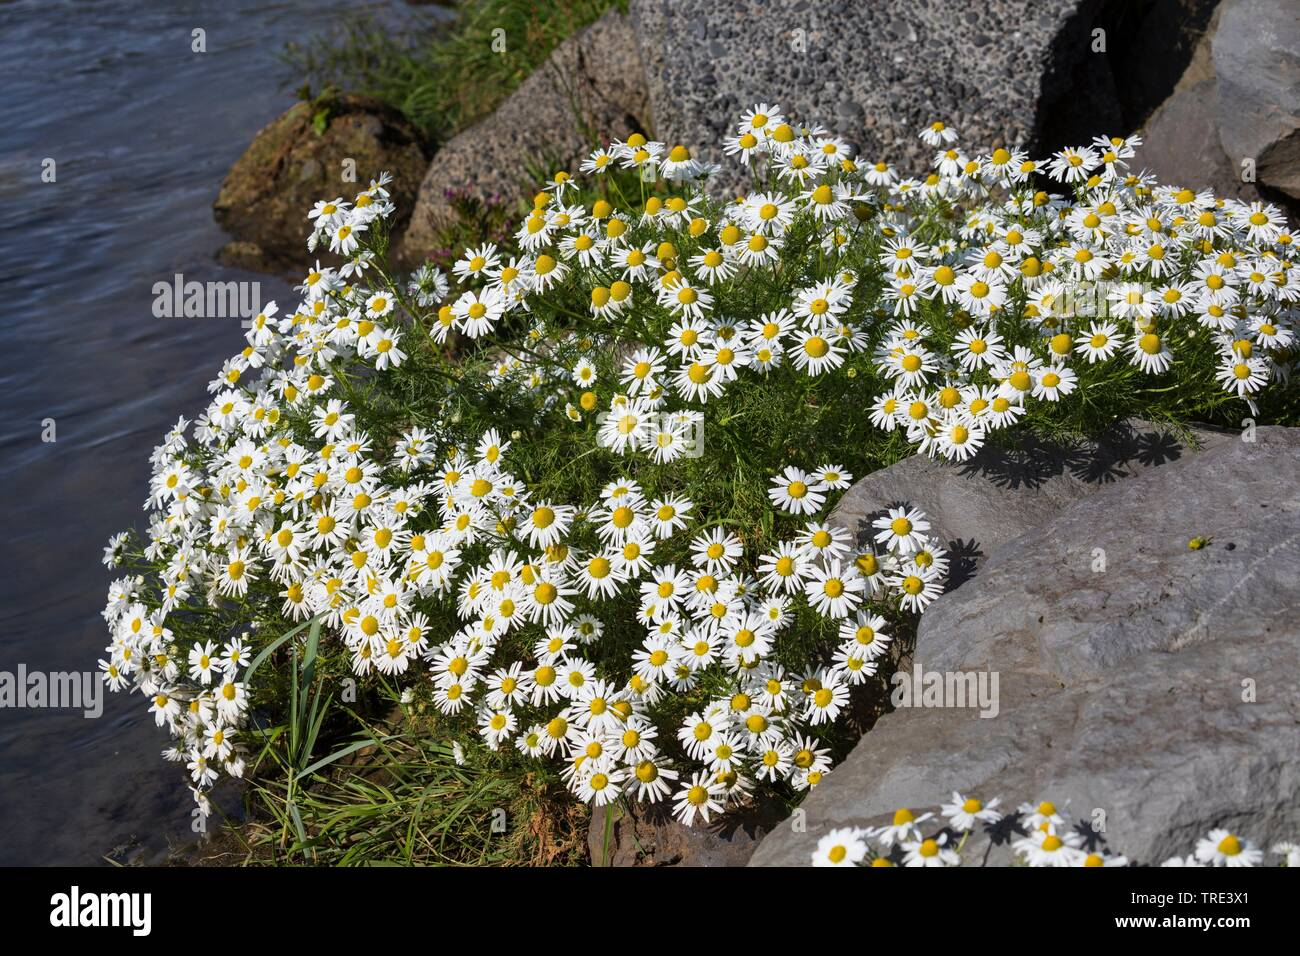 Strand-Kamille, Strandkamille, Echte Strandkamille, Kuesten-Kamille, Kuestenkamille, Kuesten-Strandkamille (Tripleurospermum maritimum), bluehend, Isl - Stock Image